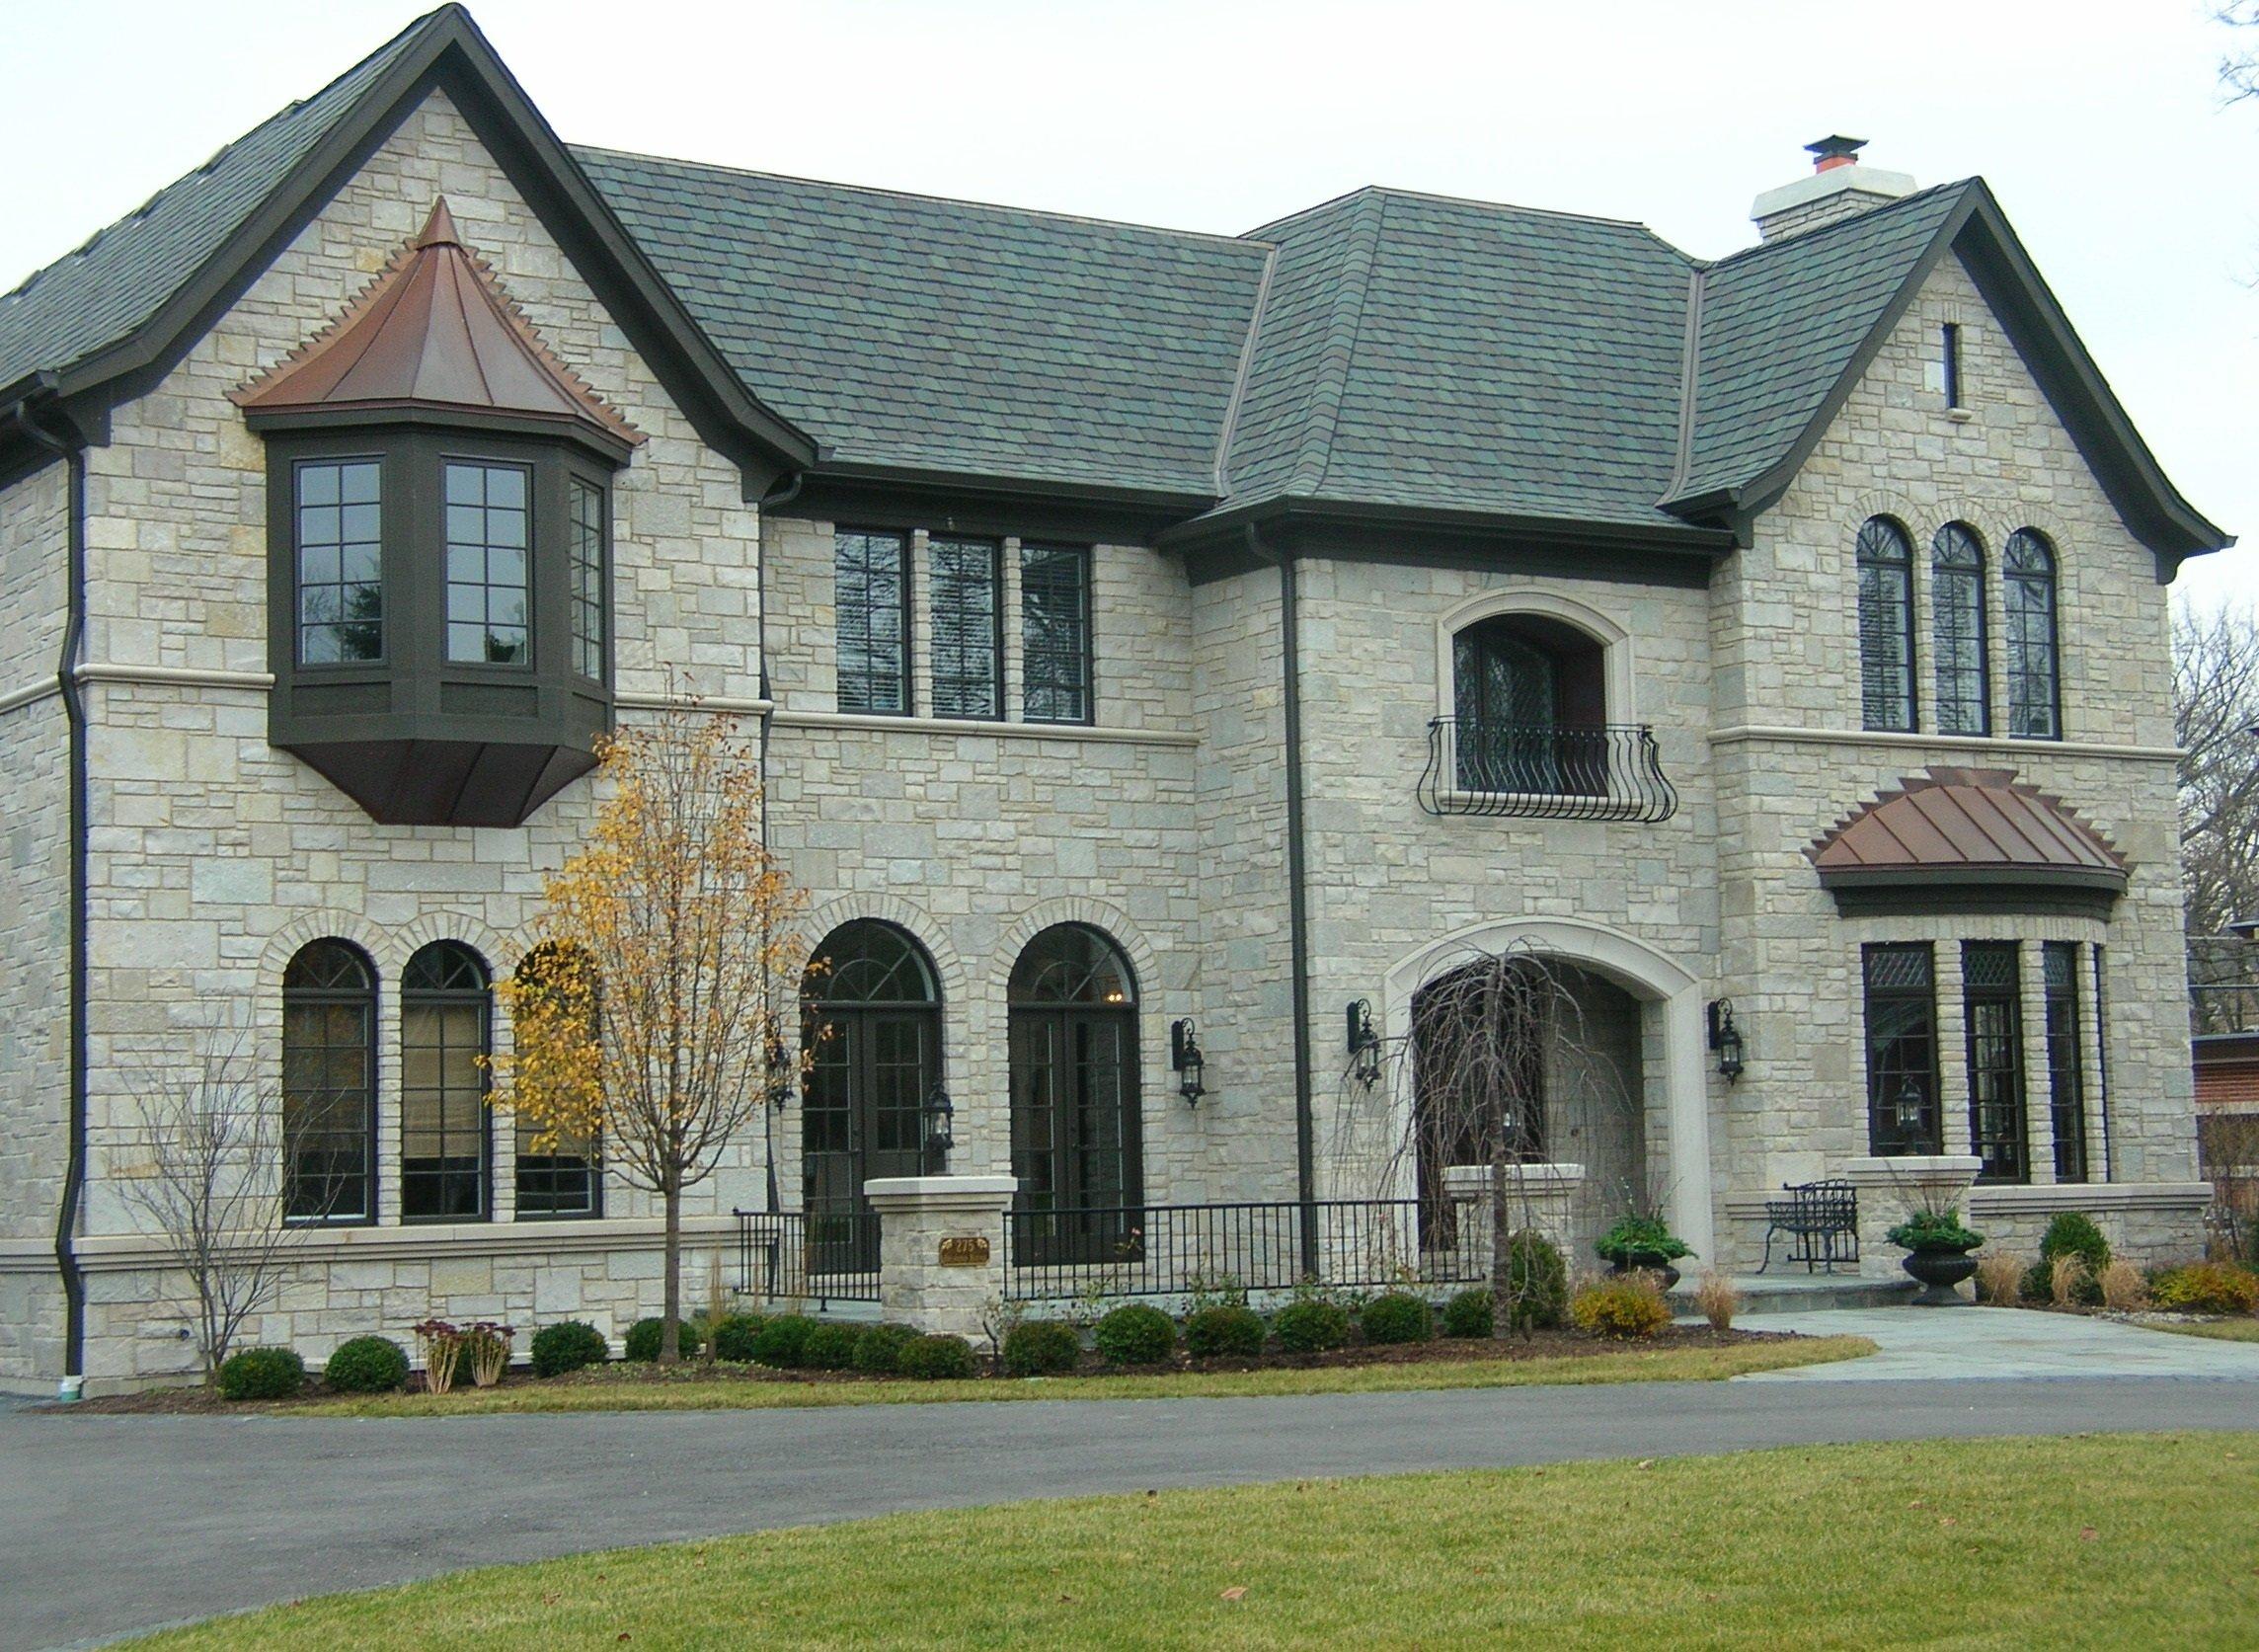 Custom Fond du Lac and Empire Blend Real Stone Veneer Exterior